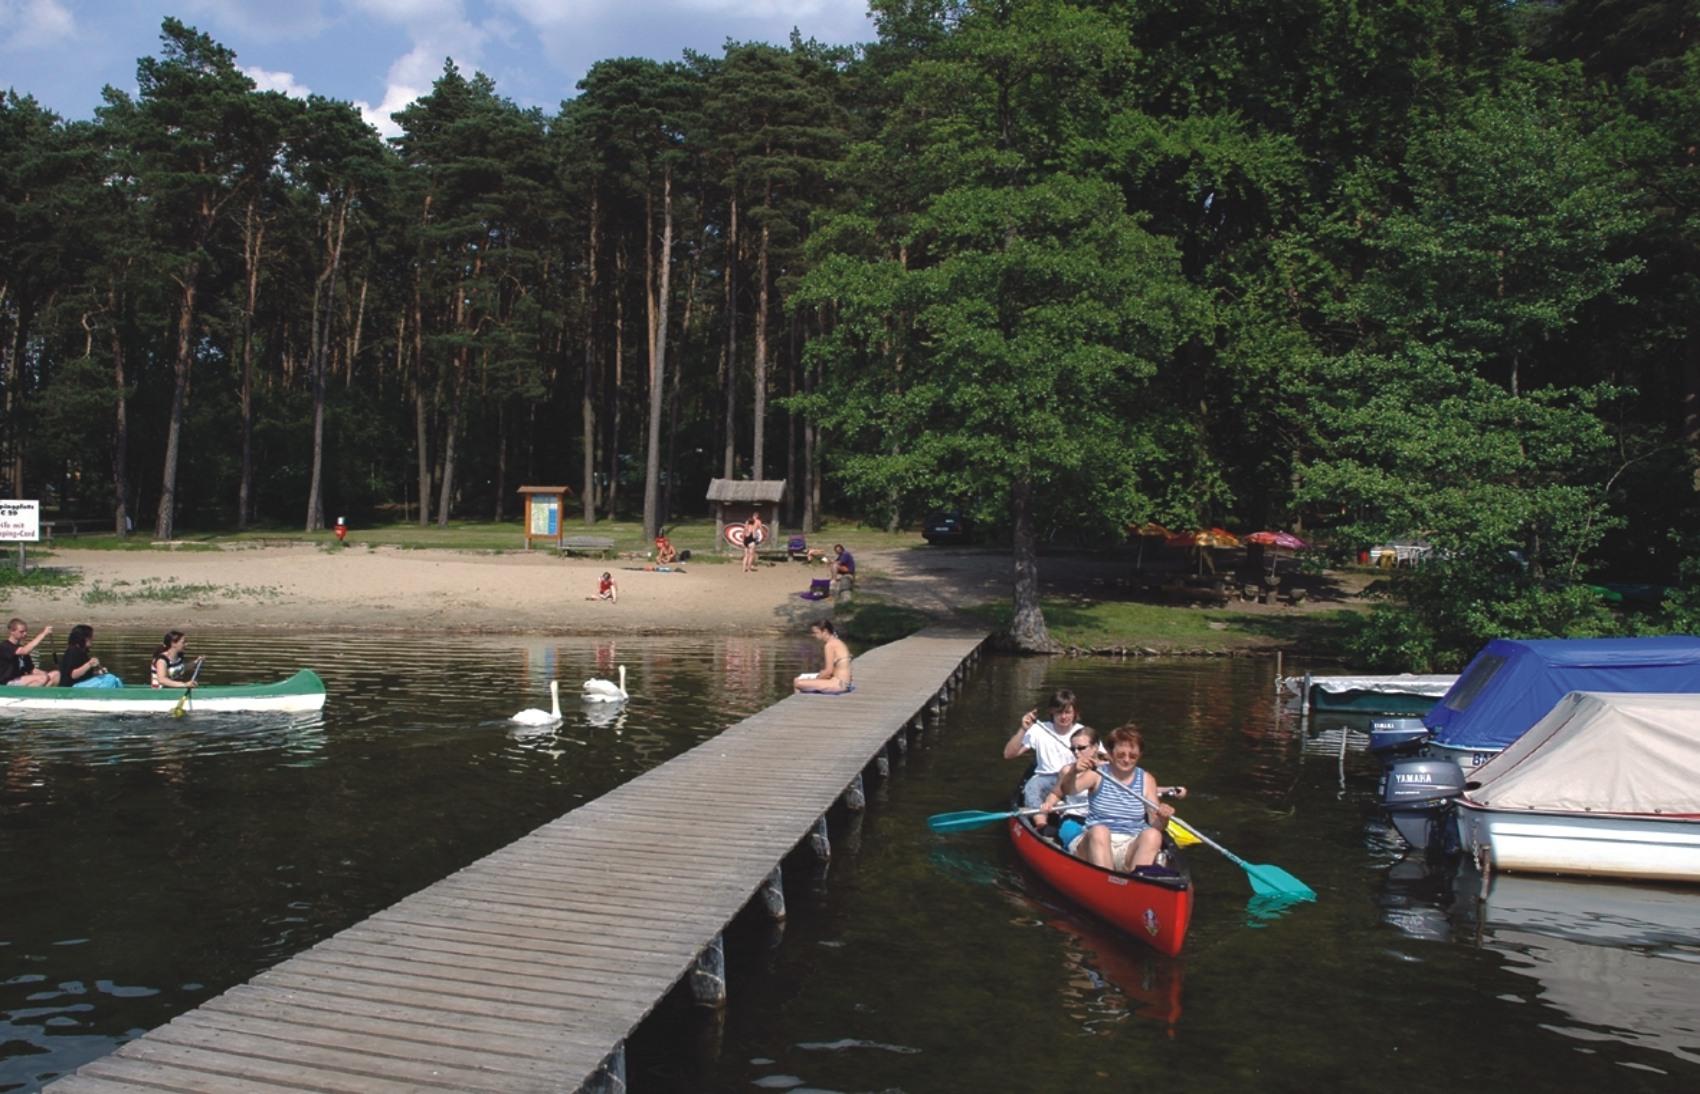 Duitsland-Schillersdorf-Campingplatz%20am%20Leppinsee-ExtraLarge Campings Duitsland